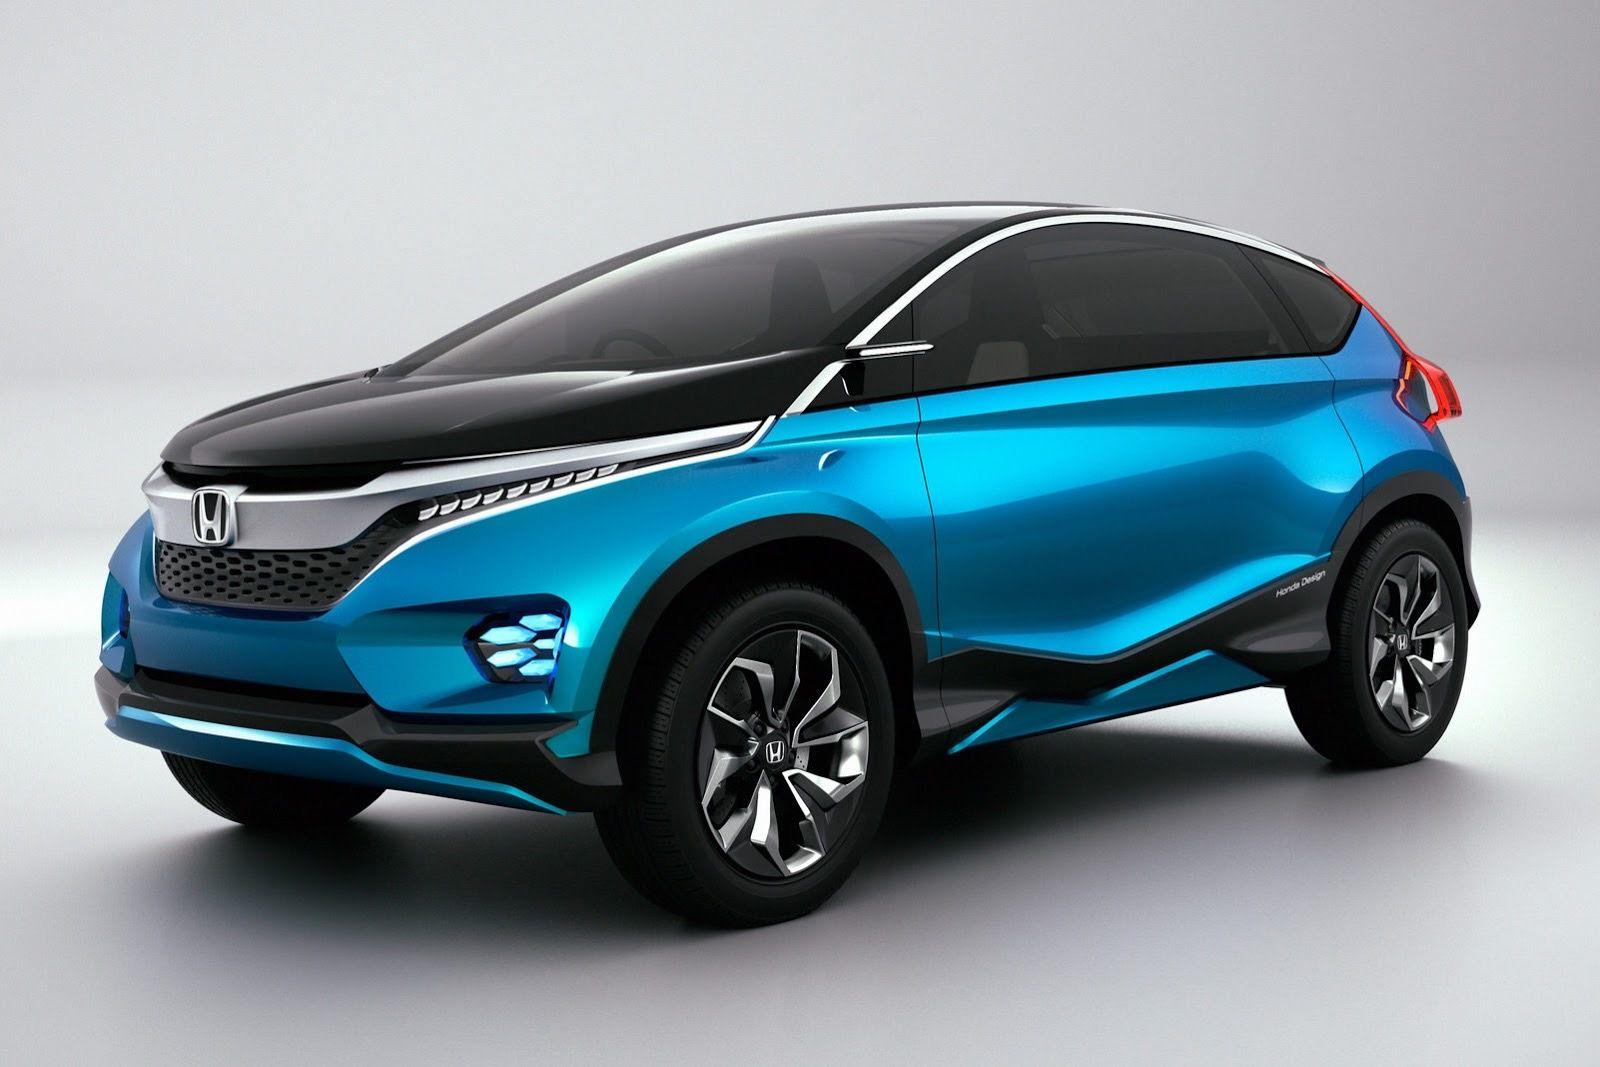 Honda Vision XS1 cars, New cars